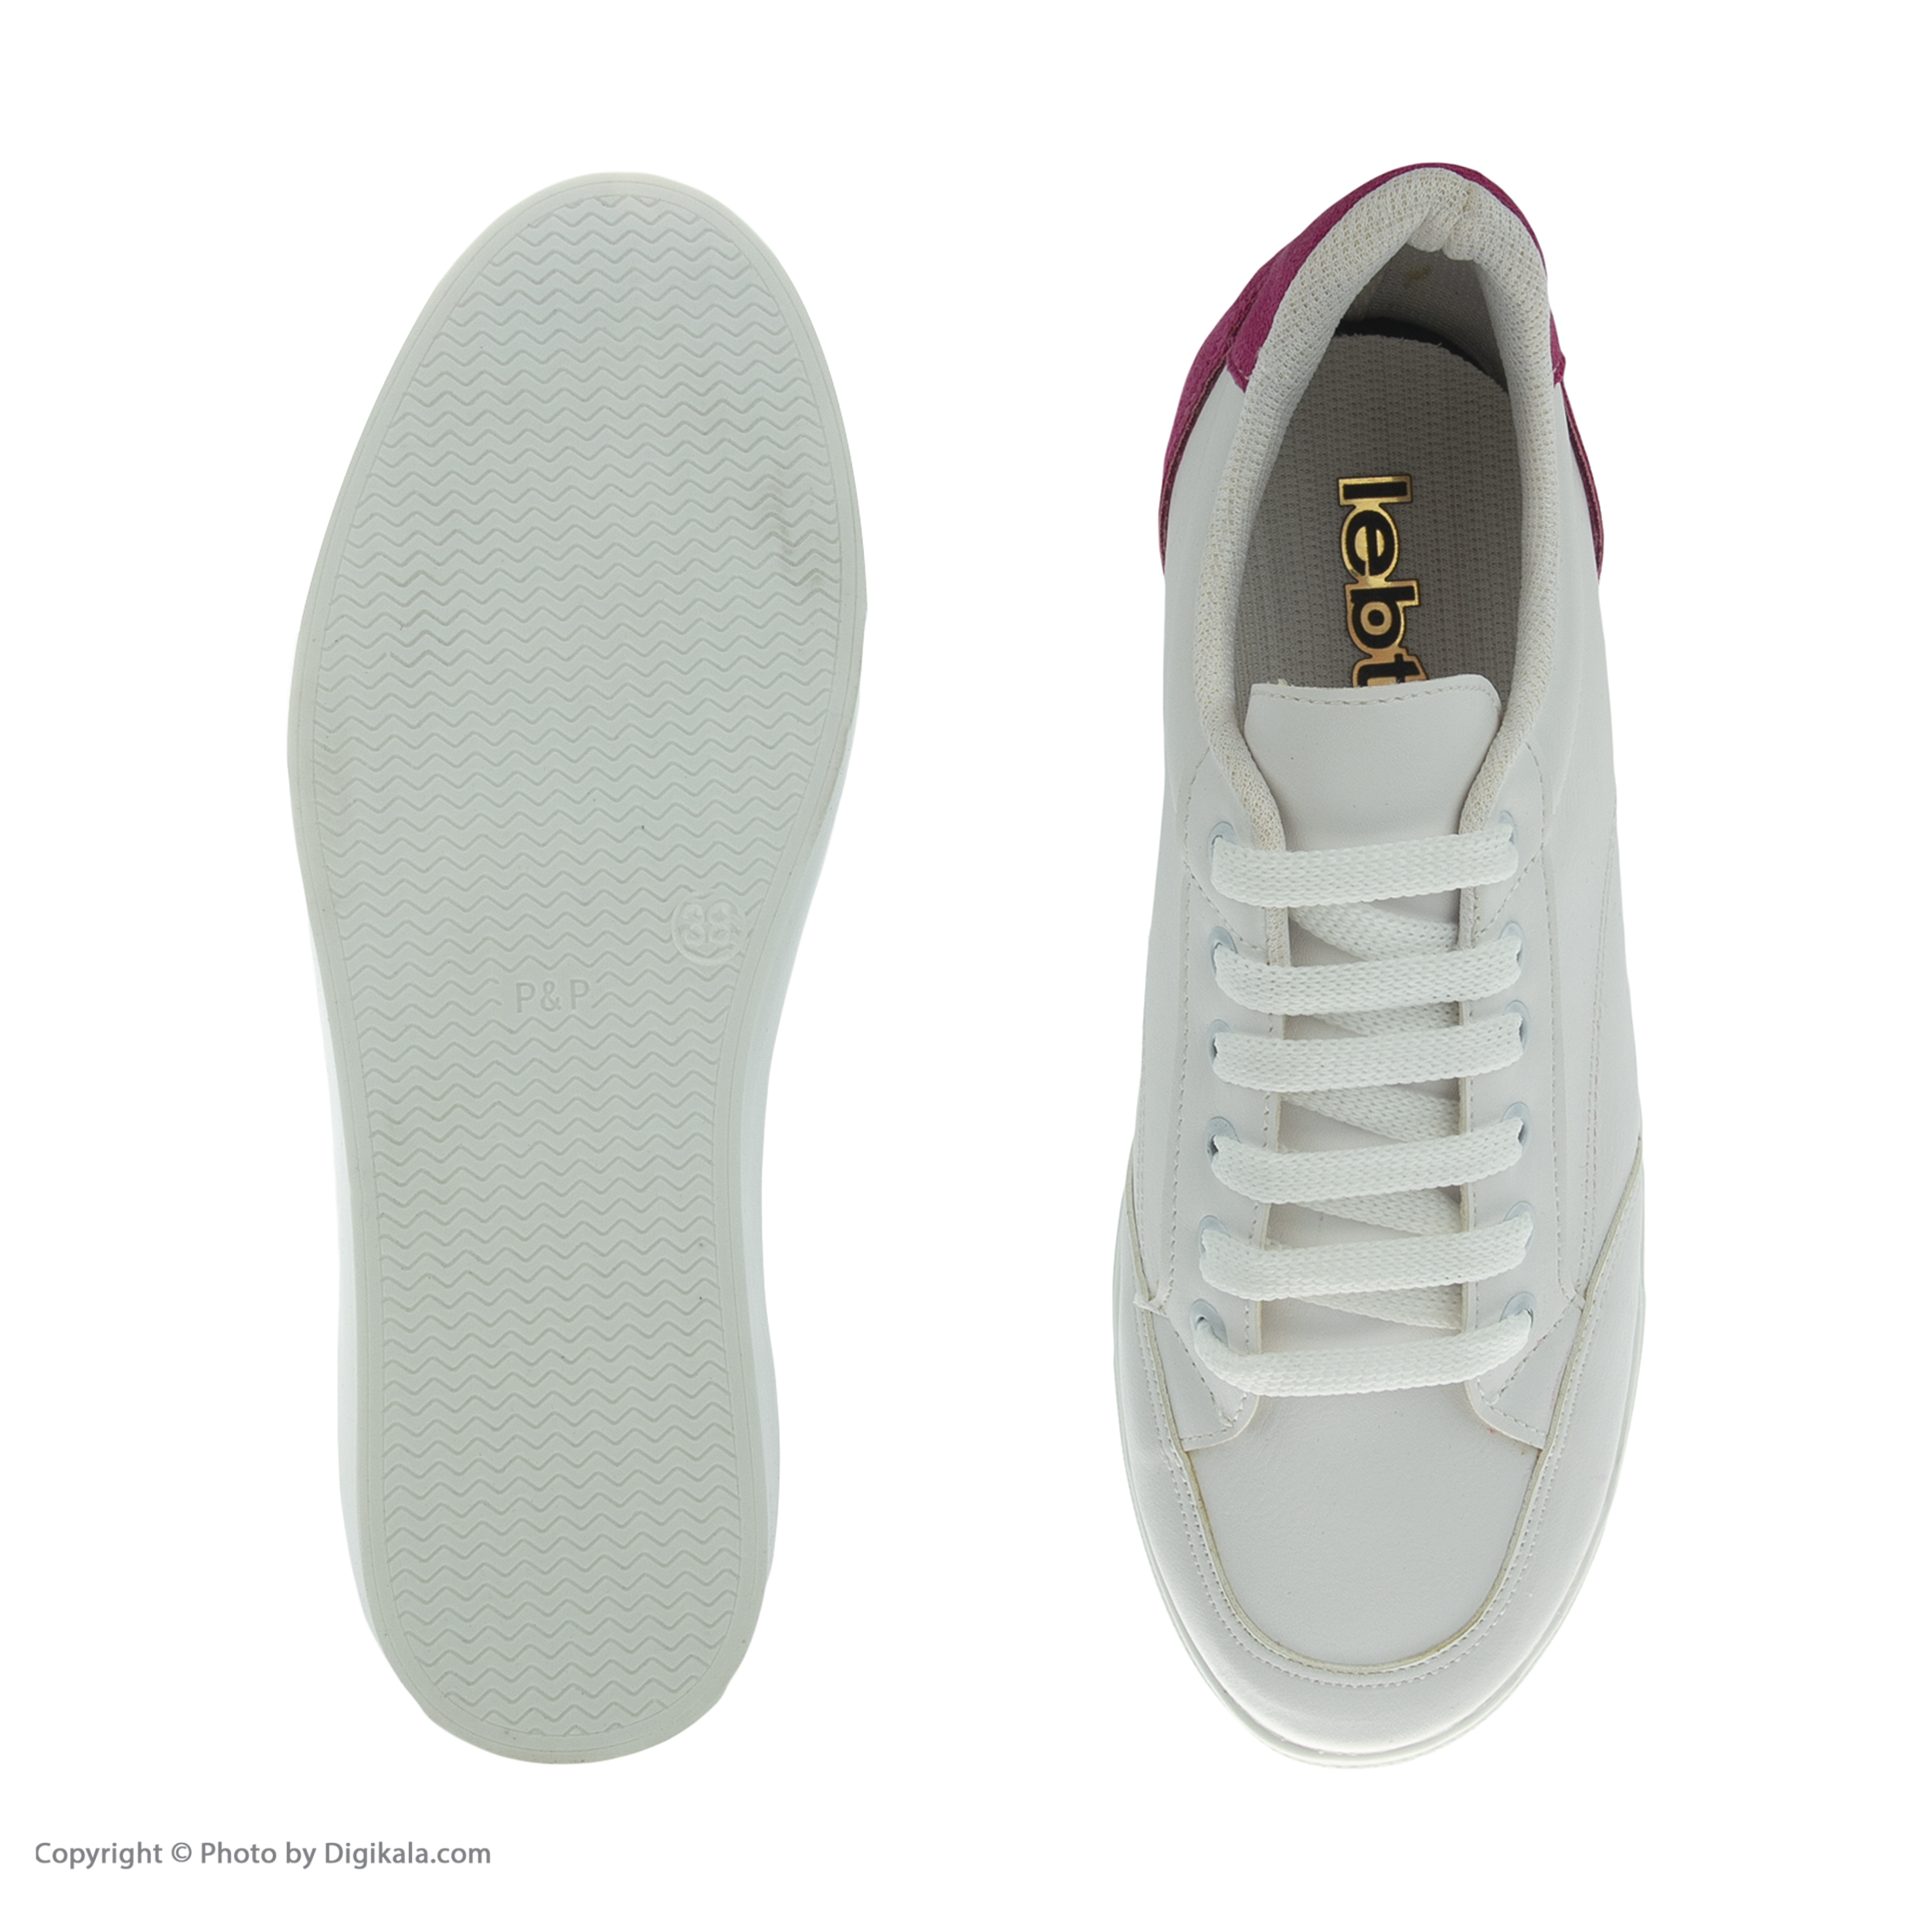 خرید                                      کفش روزمره زنانه لبتو مدل 1111-01